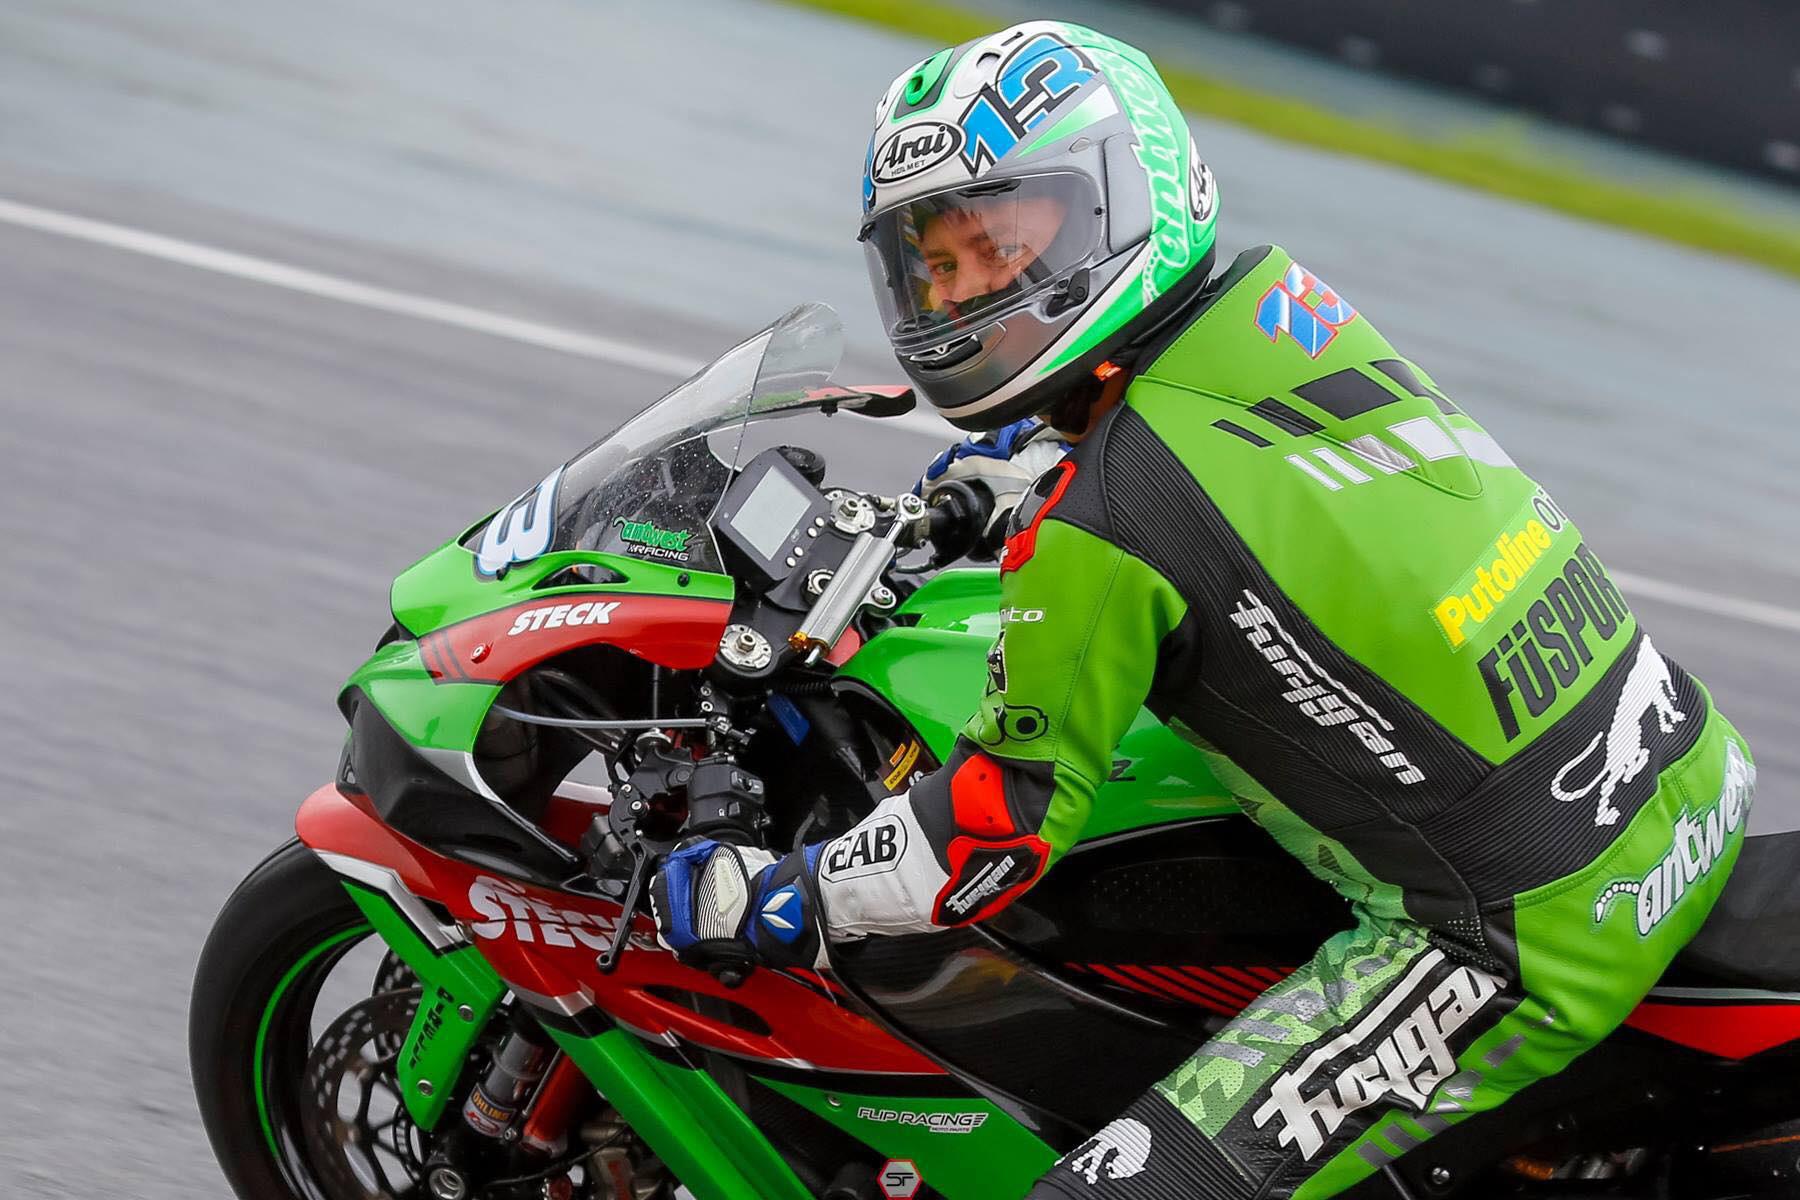 2016 MotoGP Misano Images Gallery C | MCNews.com.au